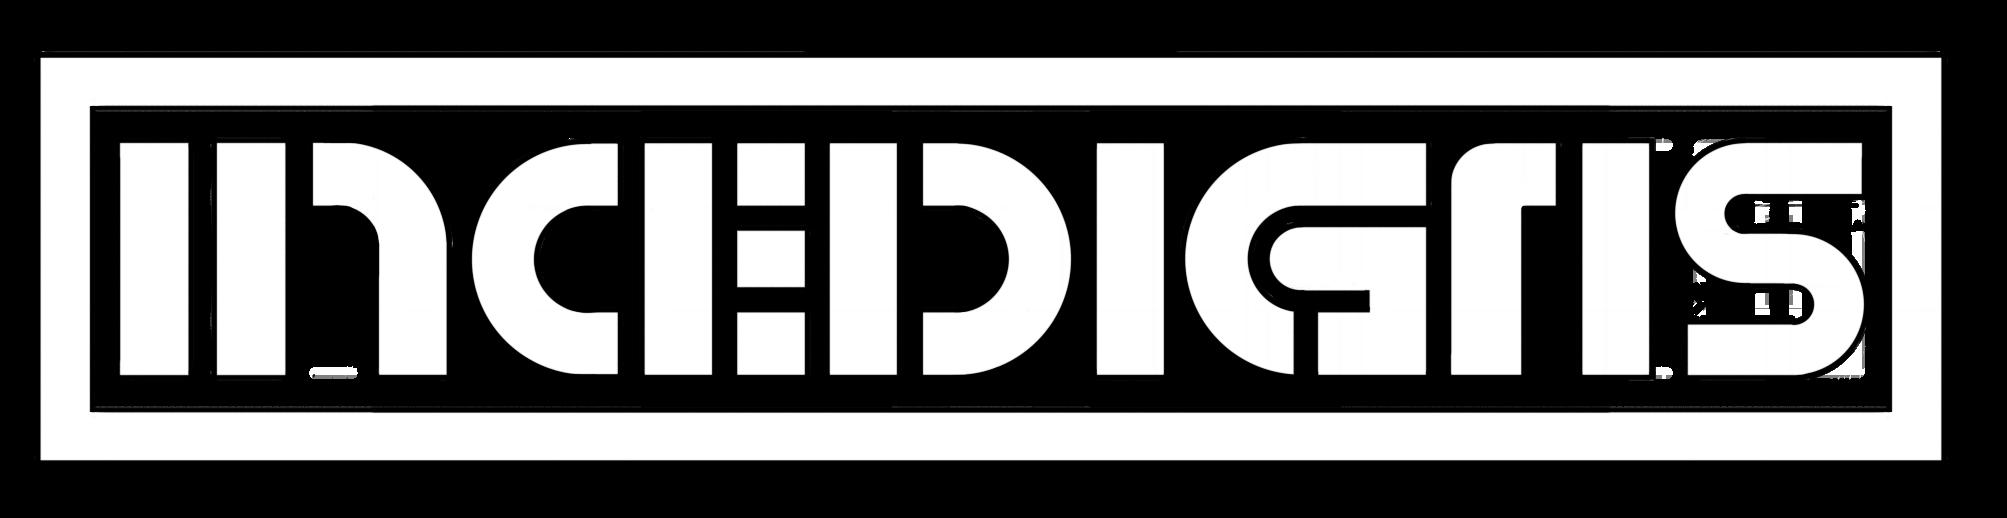 INCEDIGRIS_Logo1_CLEAN.png